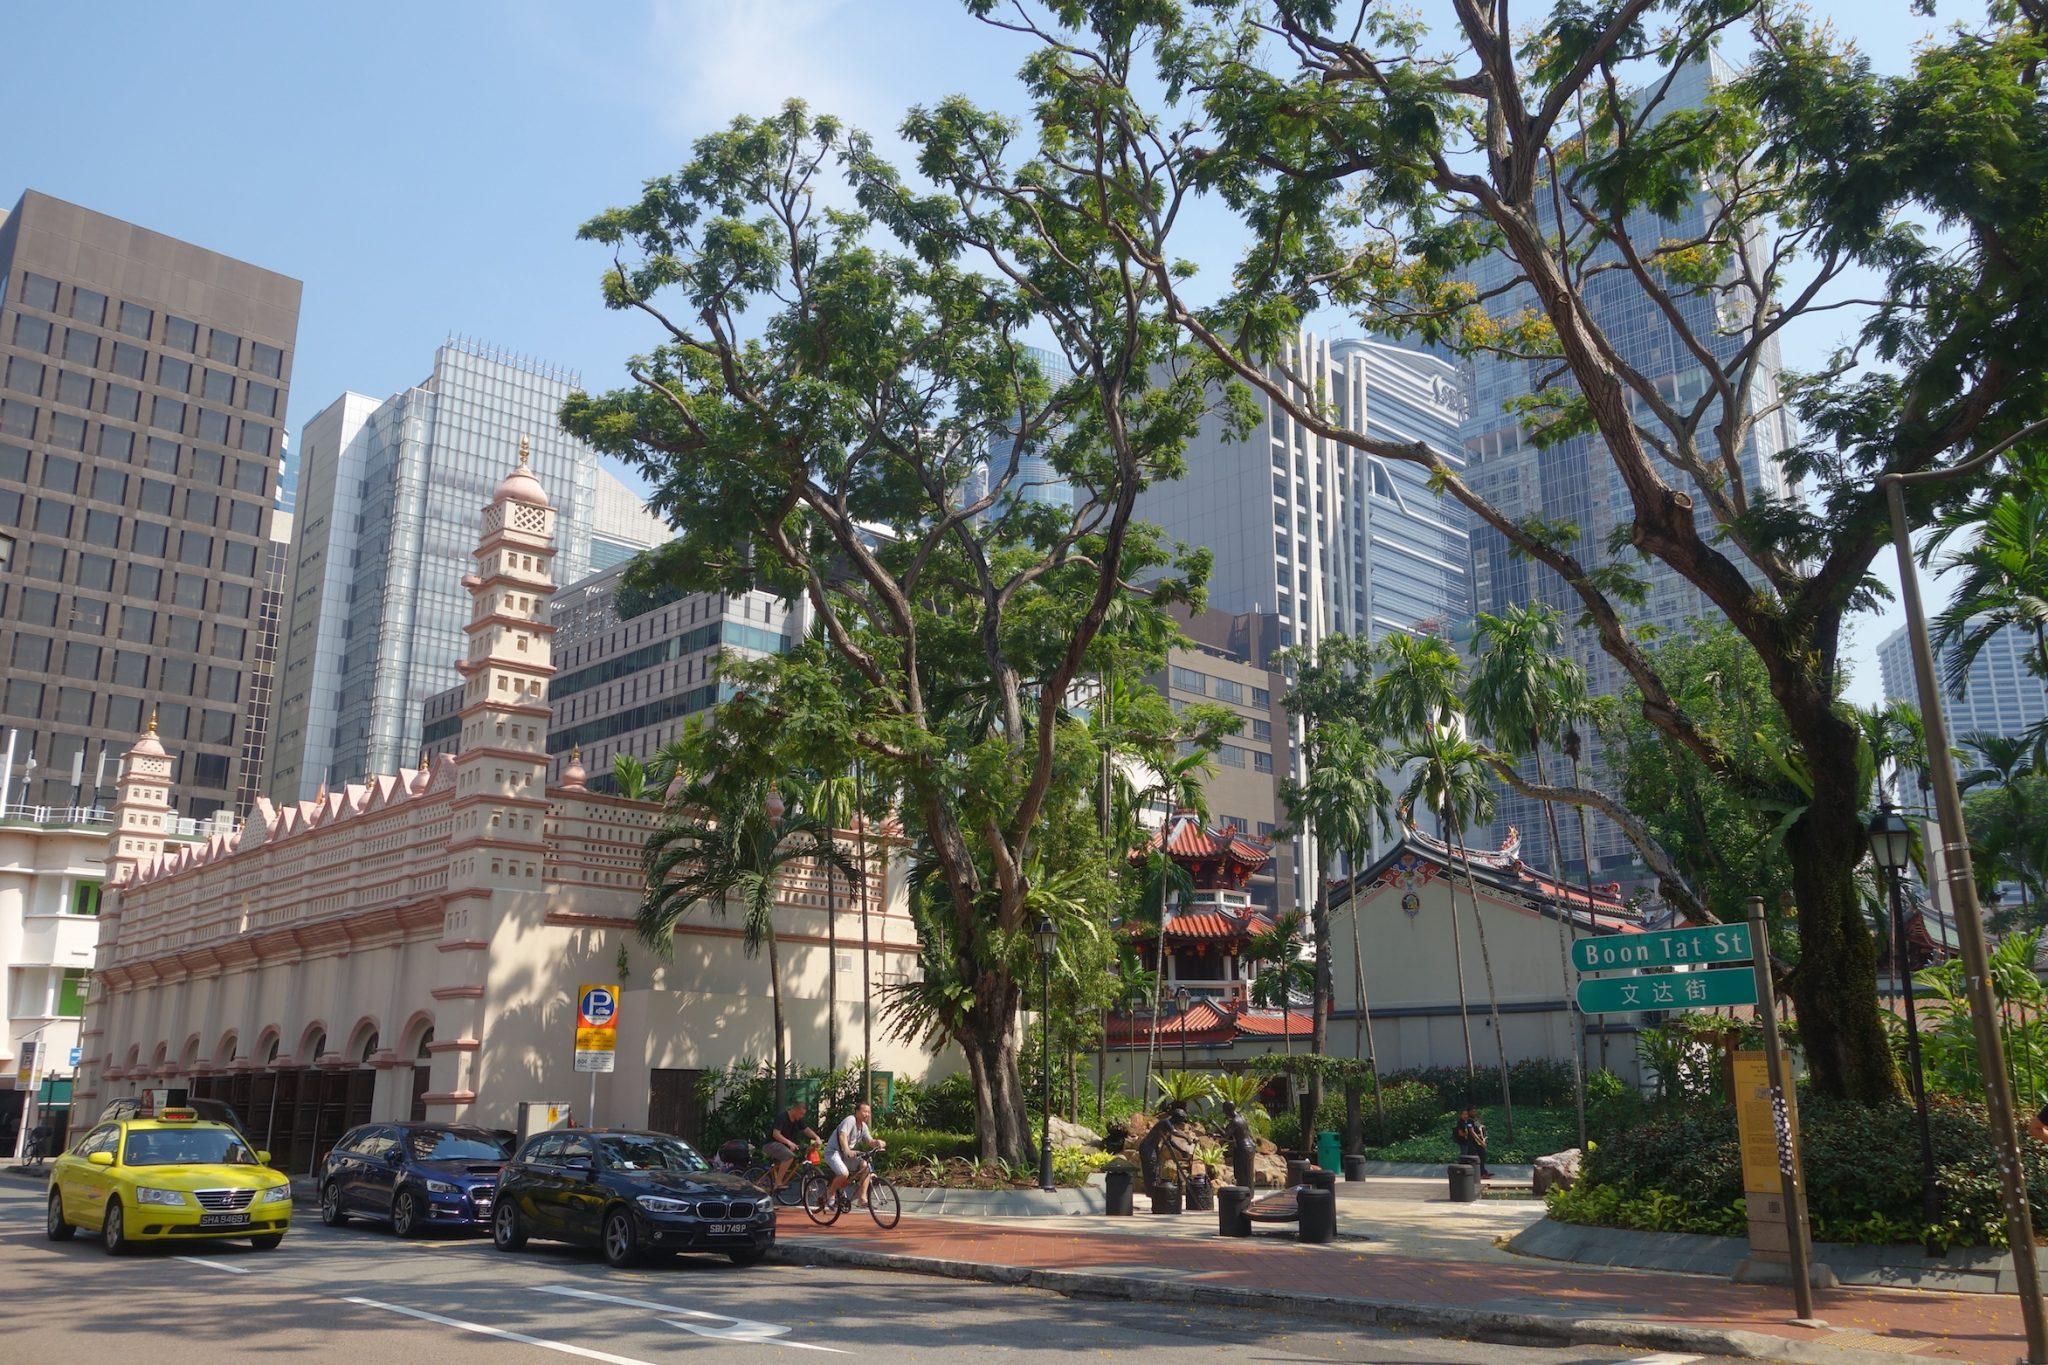 Singapur_TanjongPagar_Chinatown_15_BoonTatStreet